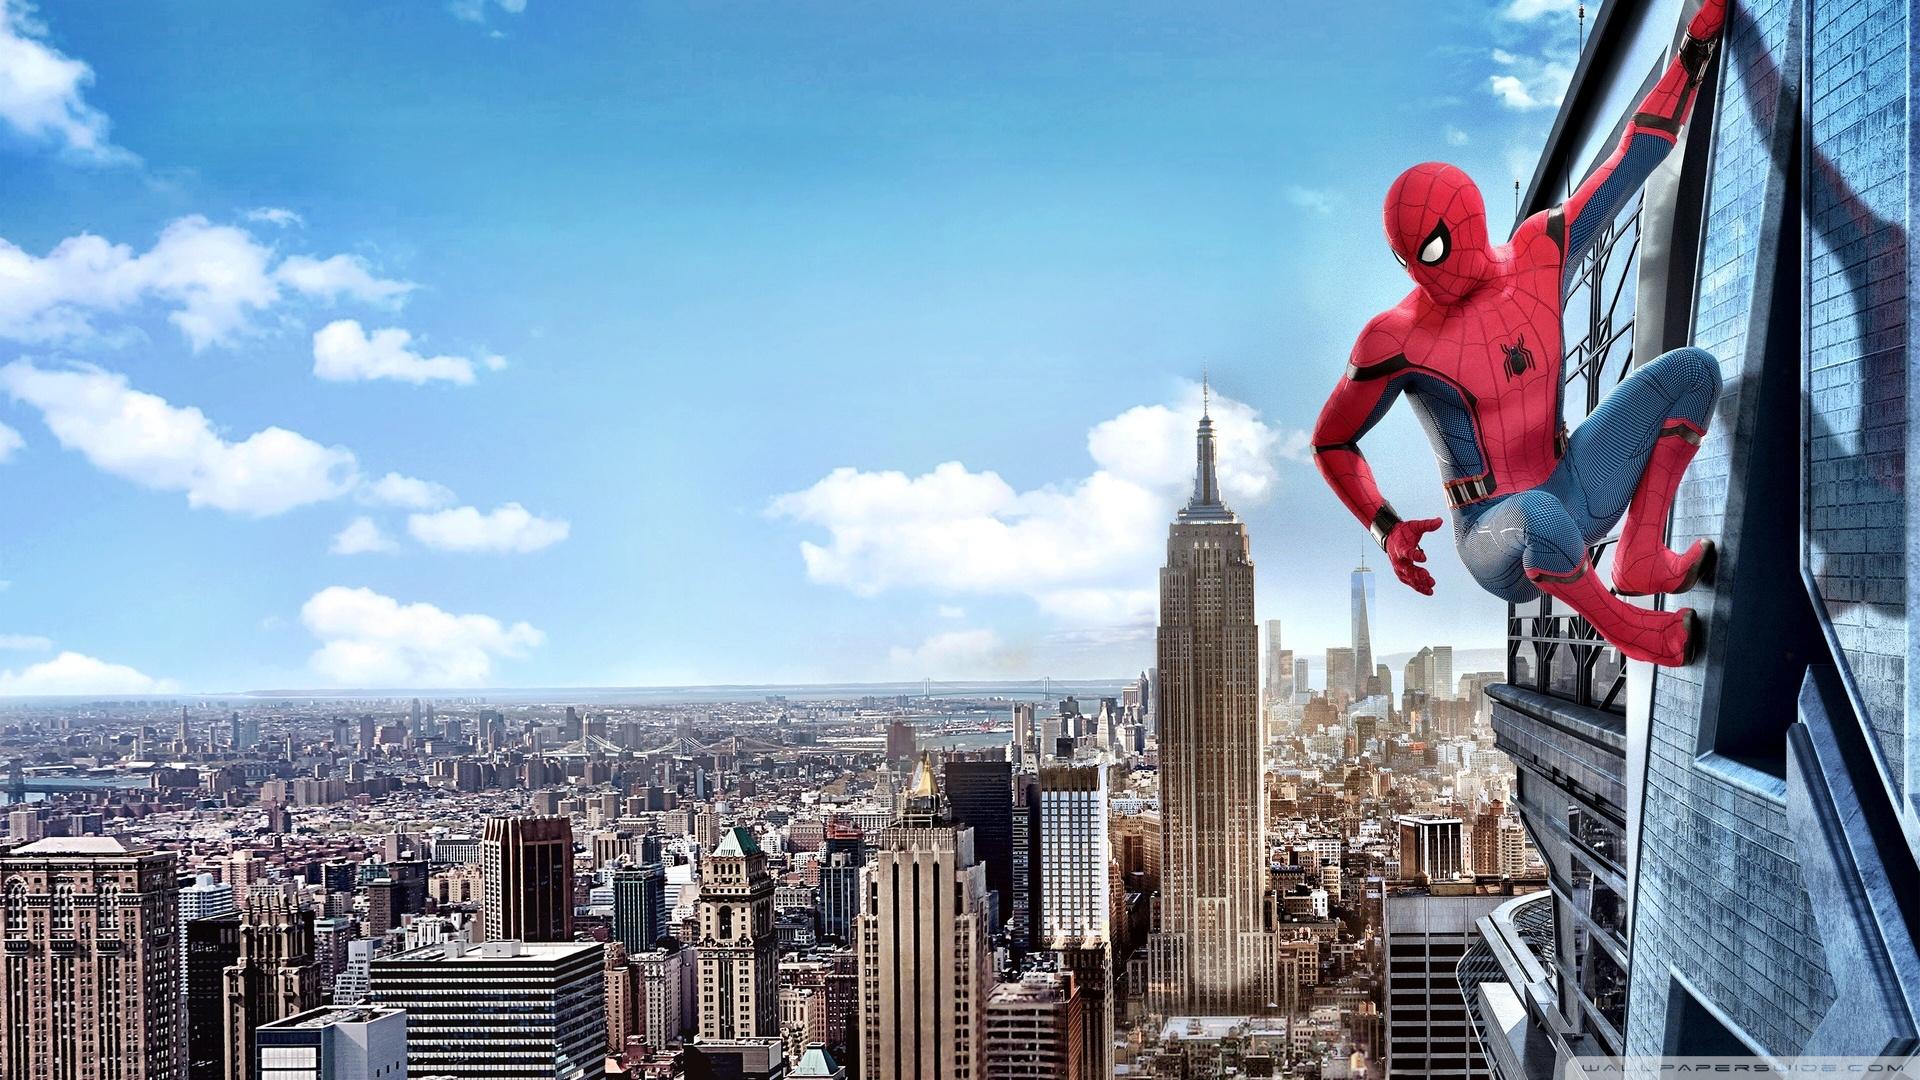 Spiderman Homecoming 4K HD Desktop Wallpaper for 4K Ultra HD TV 1920x1080